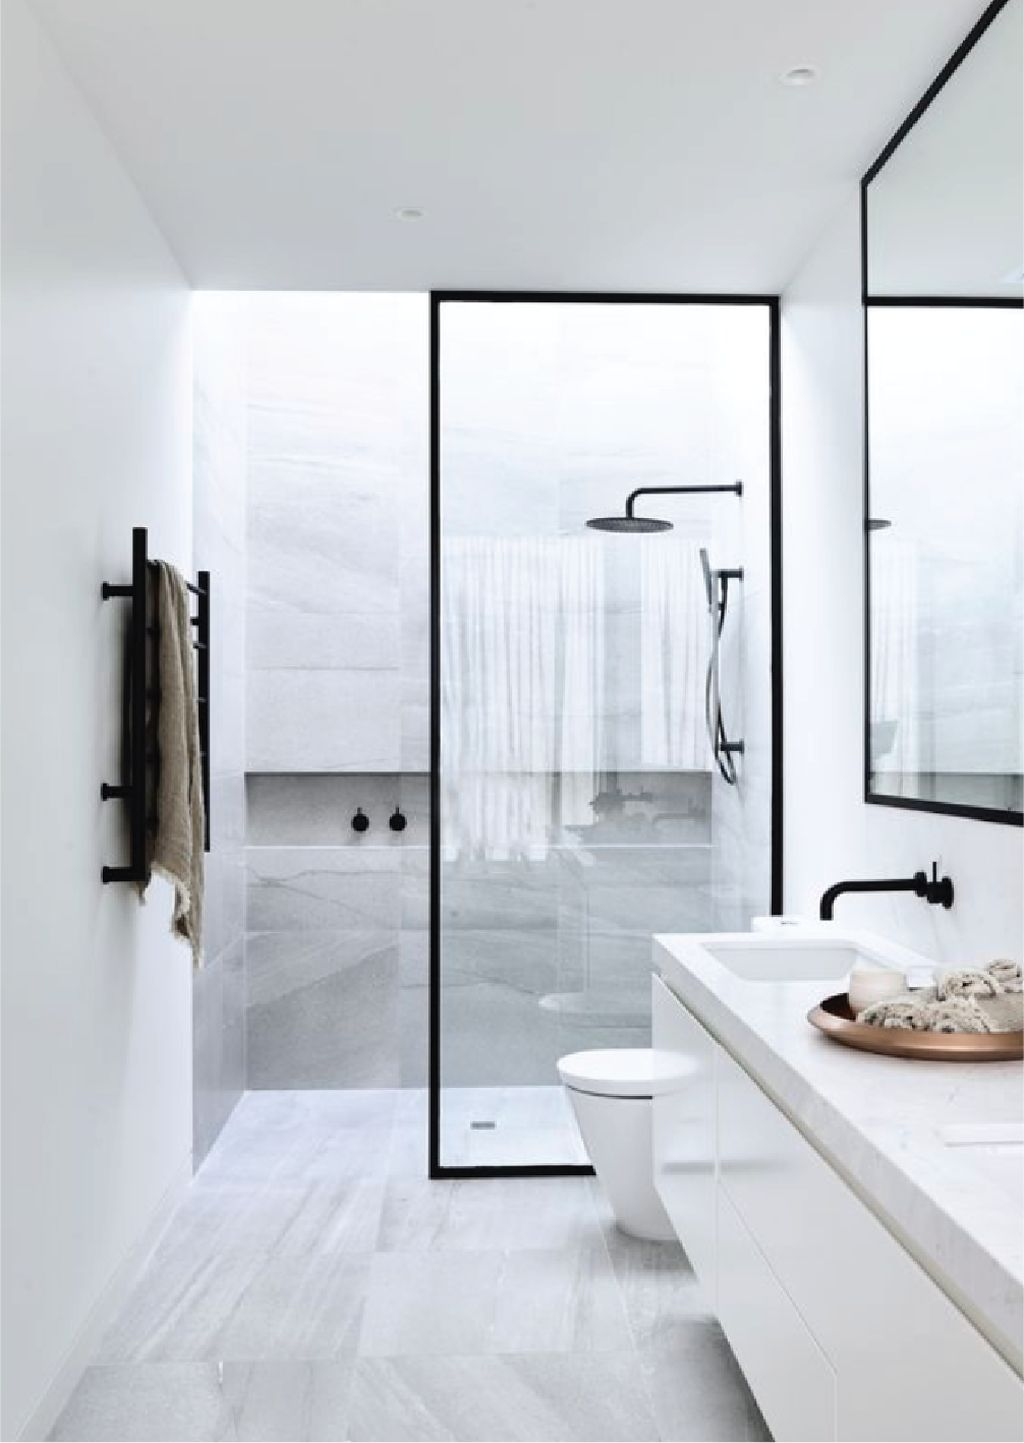 30 Excellent Bathroom Design Ideas You Should Have Minimalist Bathroom Bathroom Design Small Bathroom Interior Design